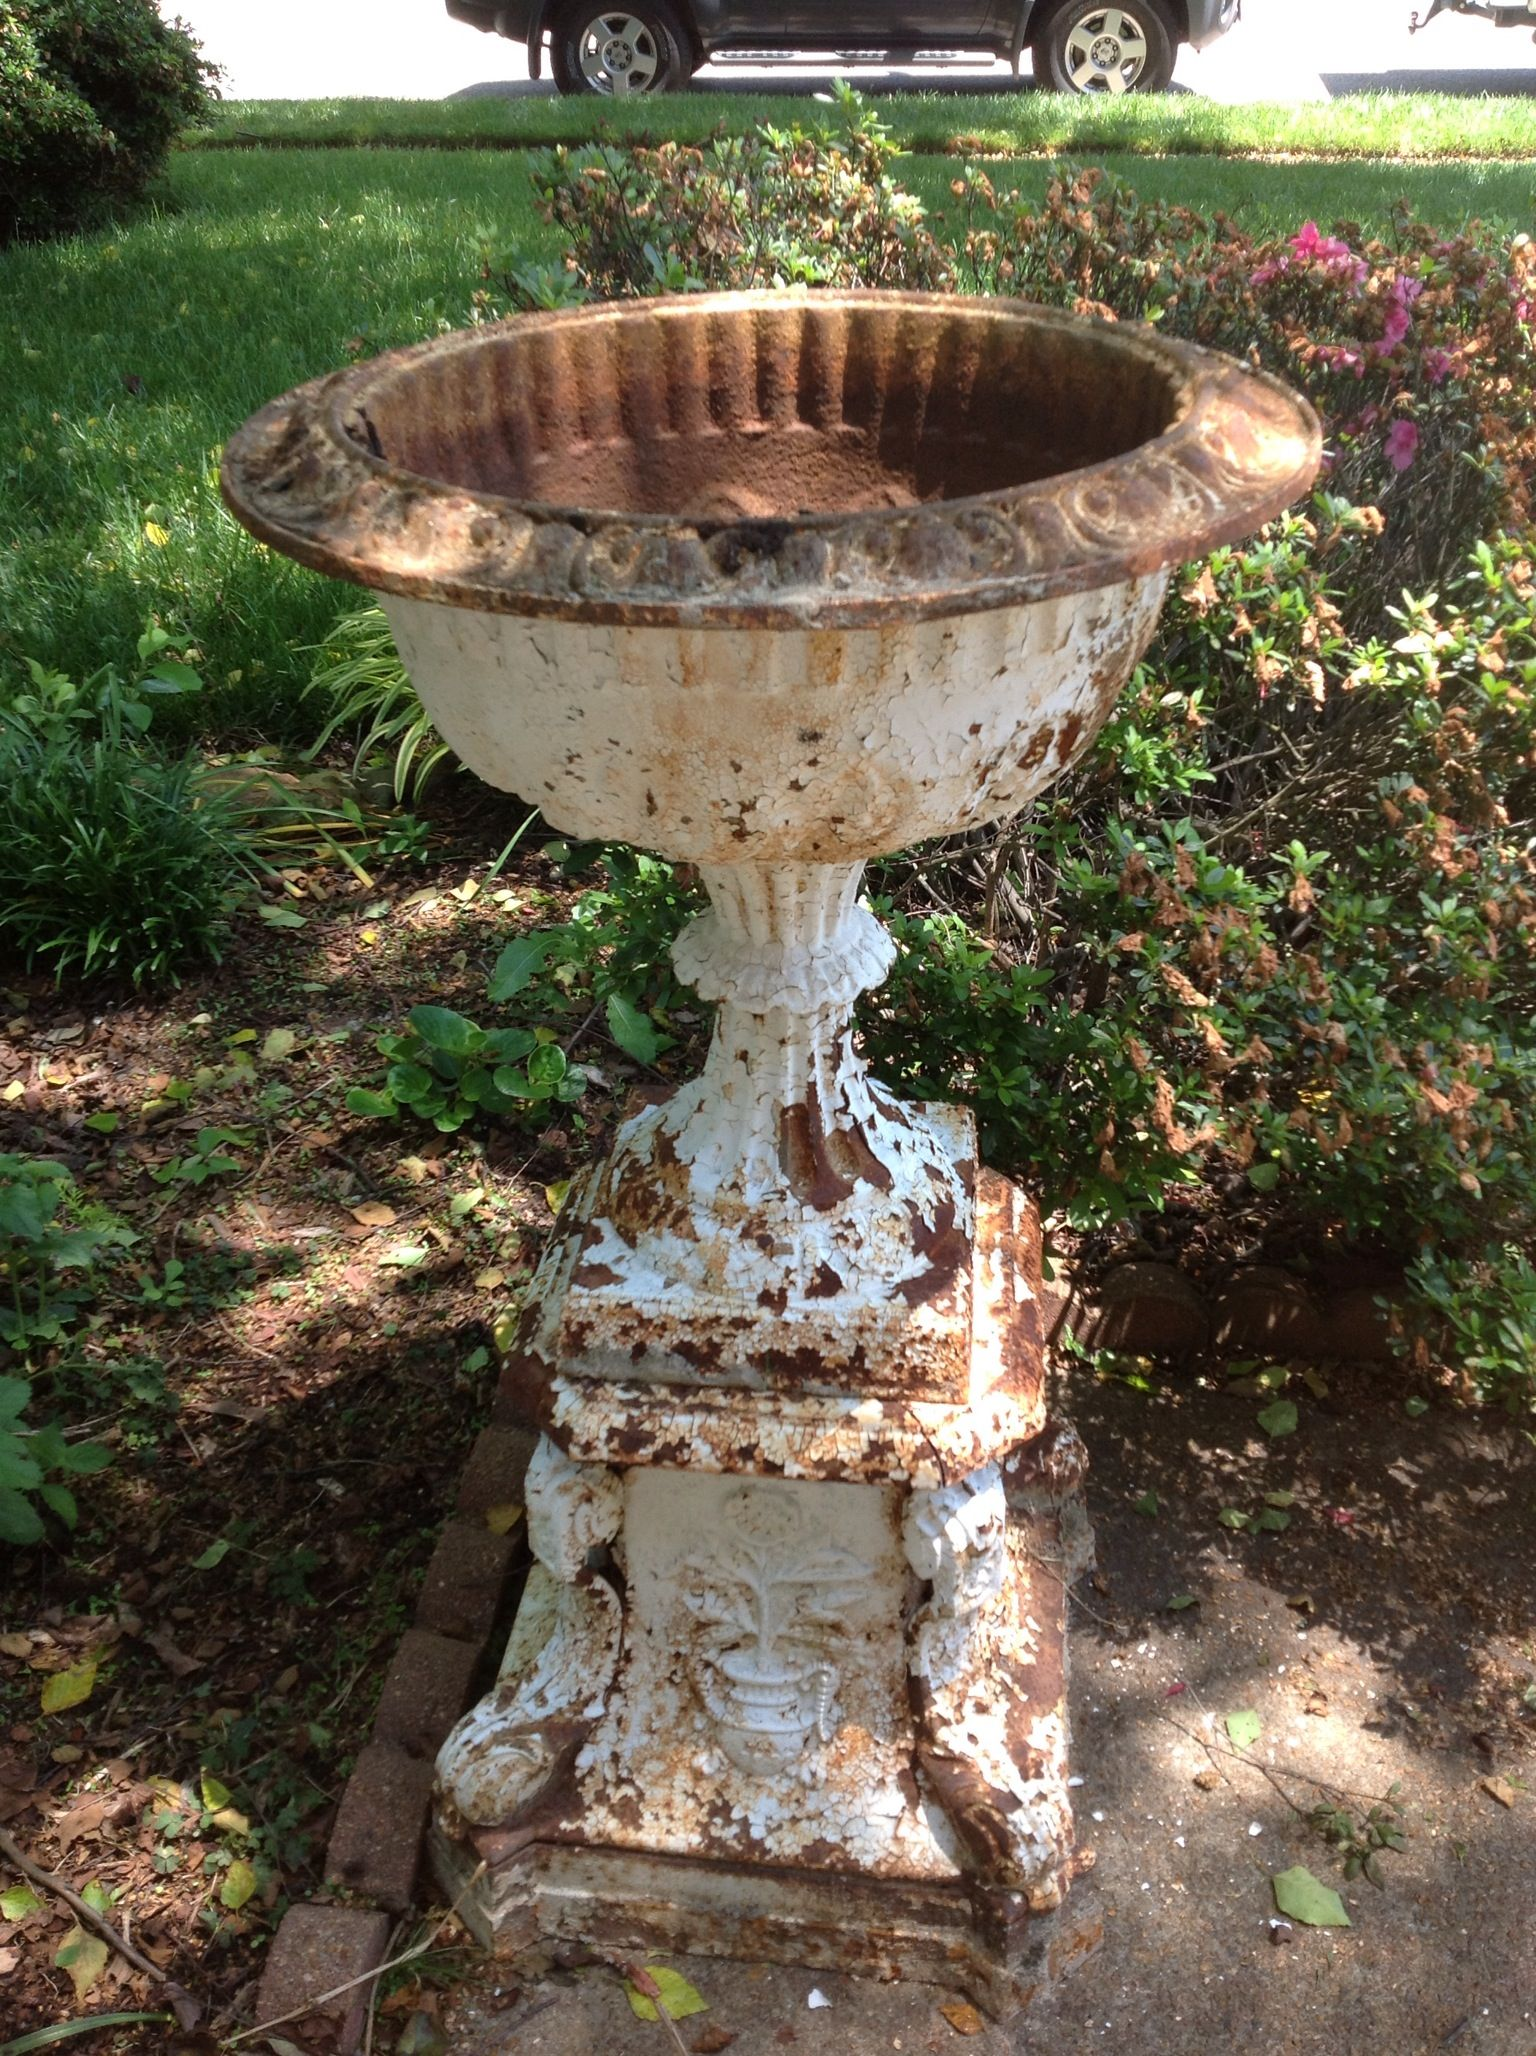 Cast Iron Garden Urn With Images Garden Urns Garden Ornaments Garden Containers